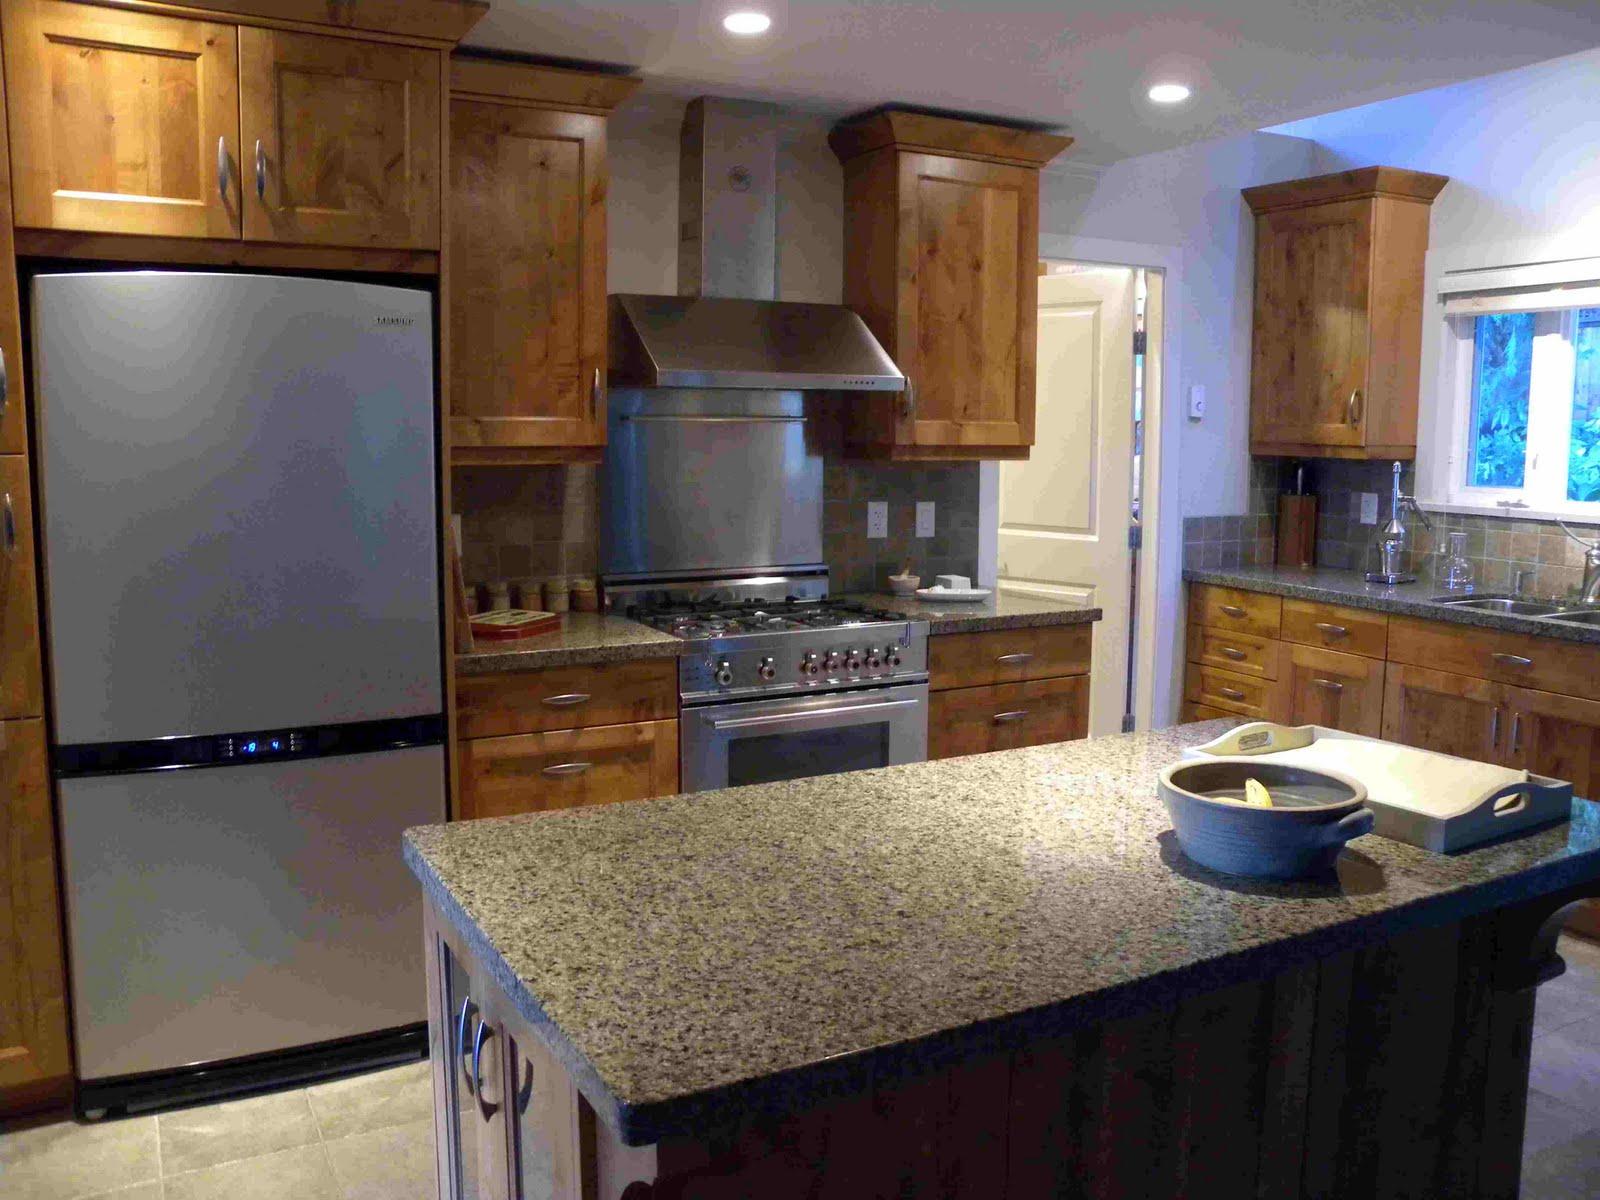 MCR Design Supply Build - Home Improvements & Renovations - 250-619-1223